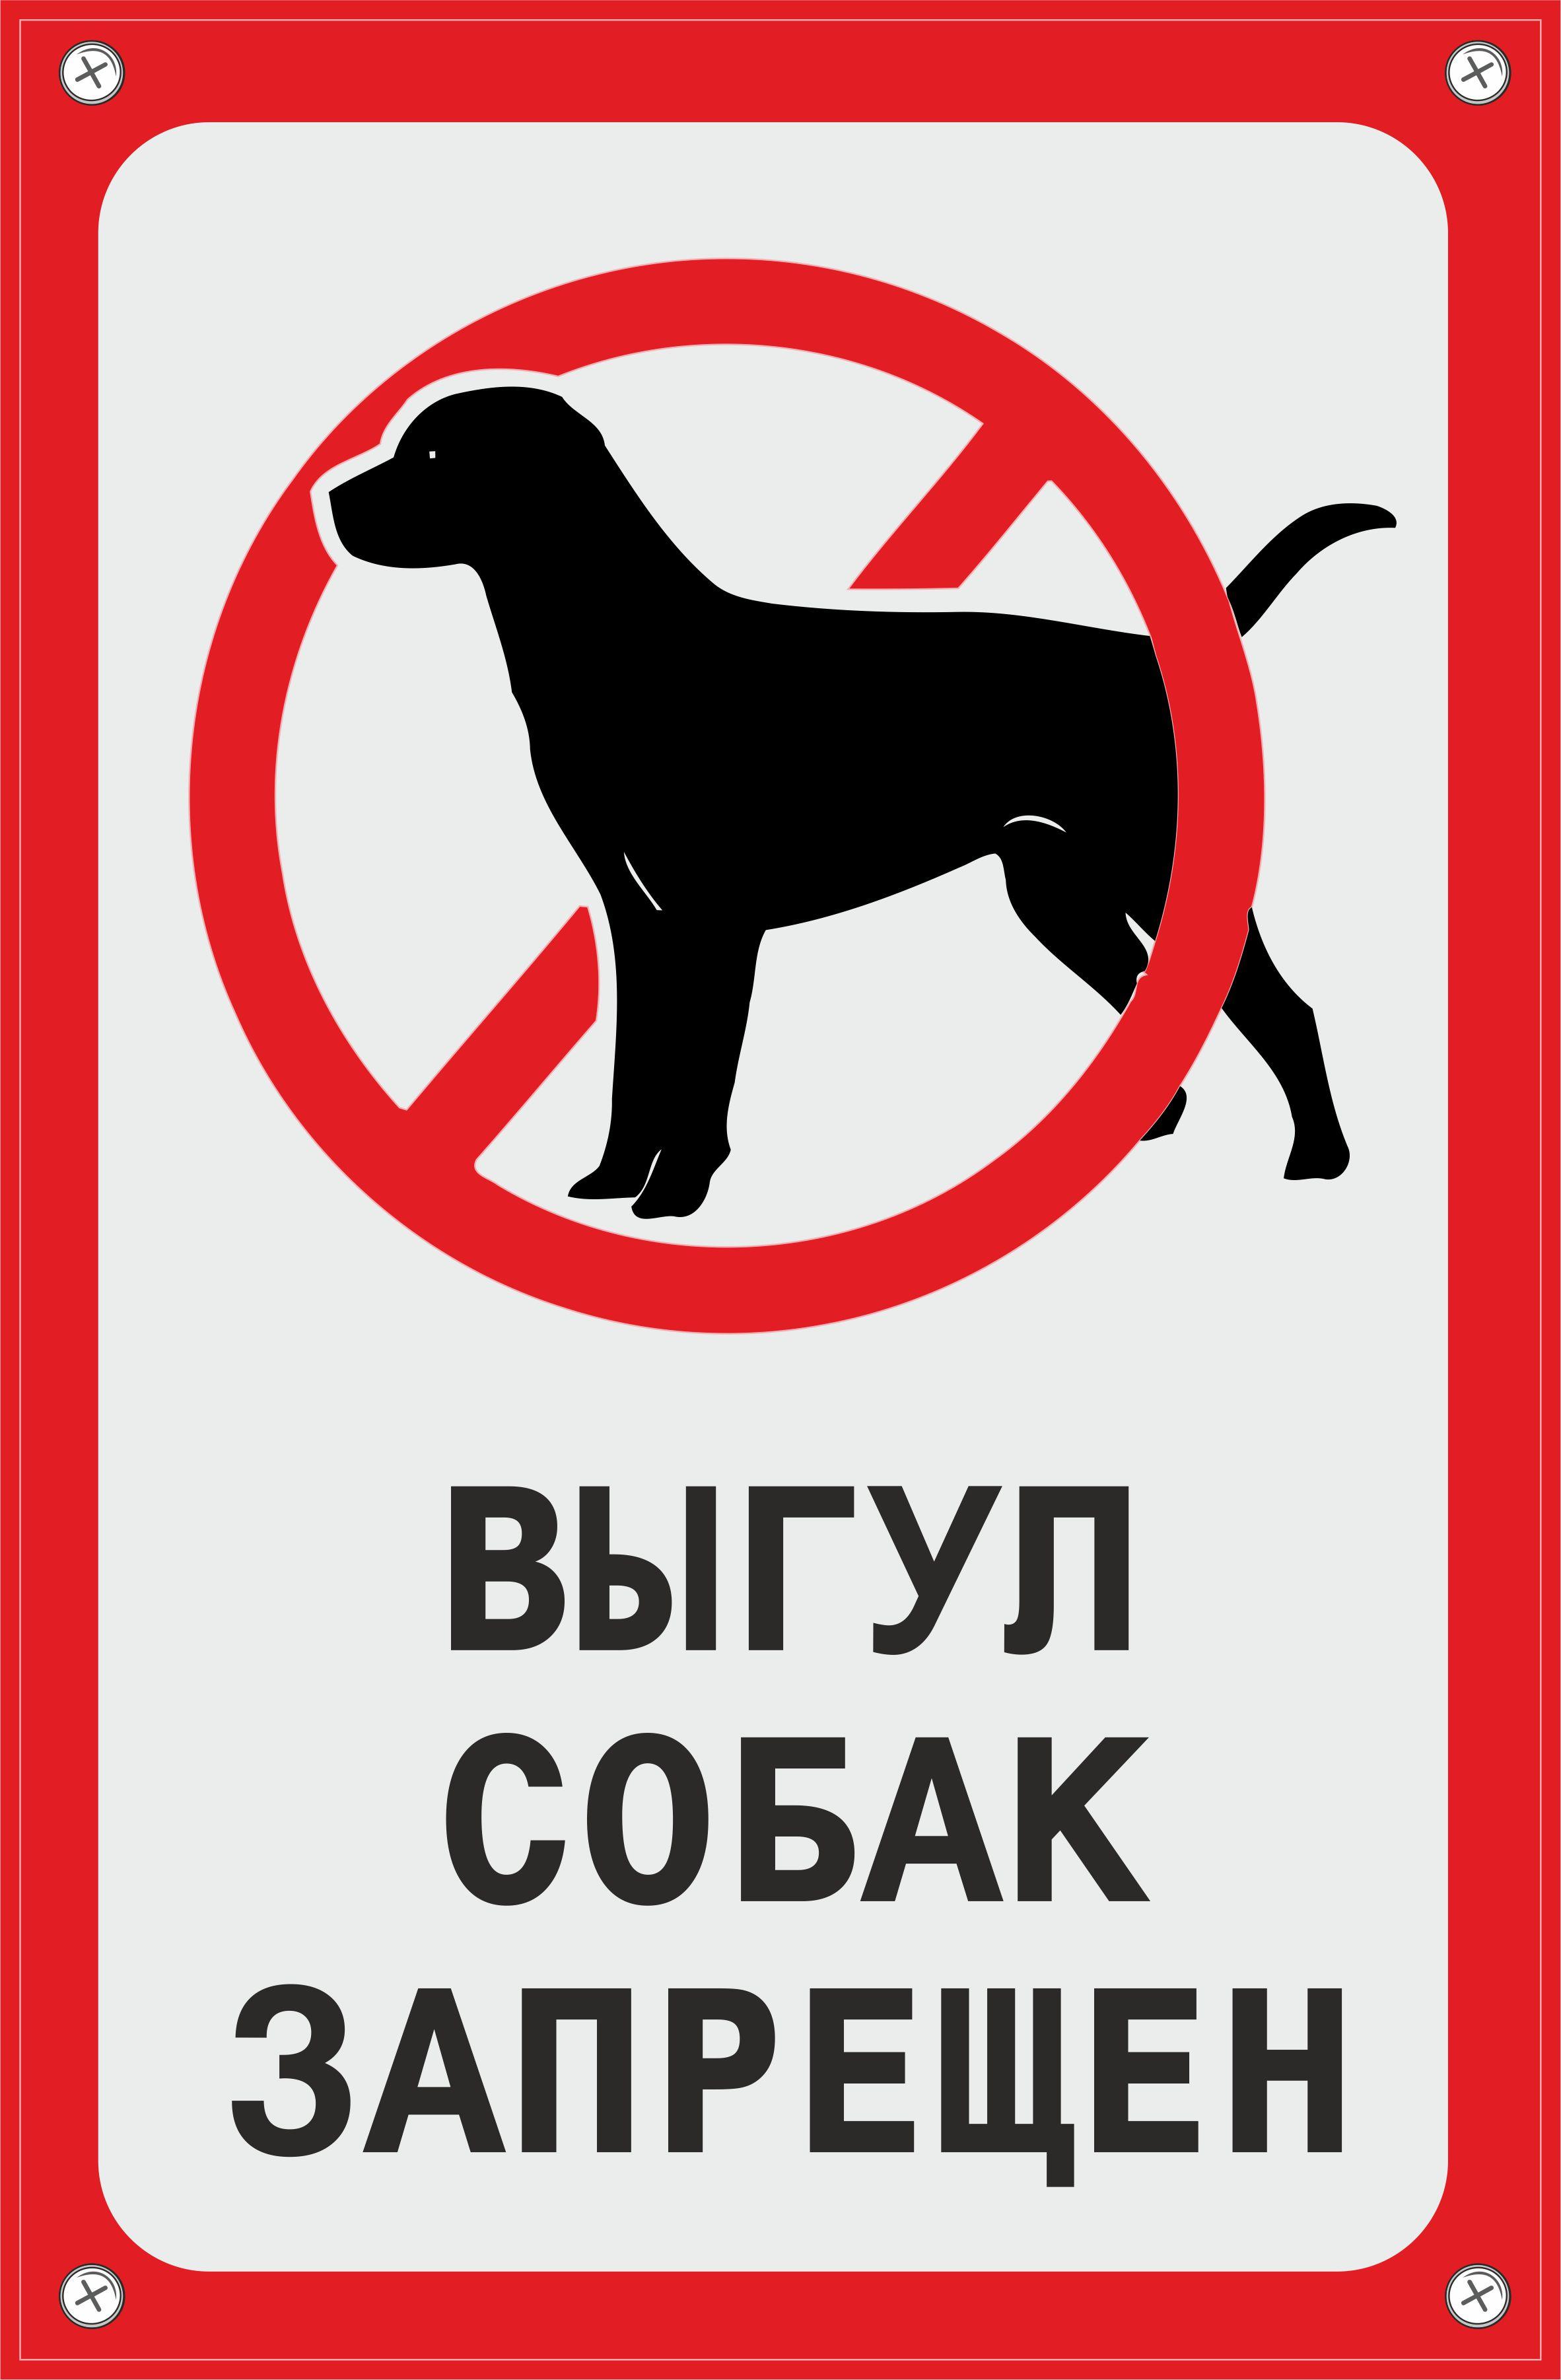 Табличка TPS 017 Выгул запрещен, пластик 3 мм,30*19,5 см табличка tps 004 собака без привязи пластик 3 мм 30 19 5 см